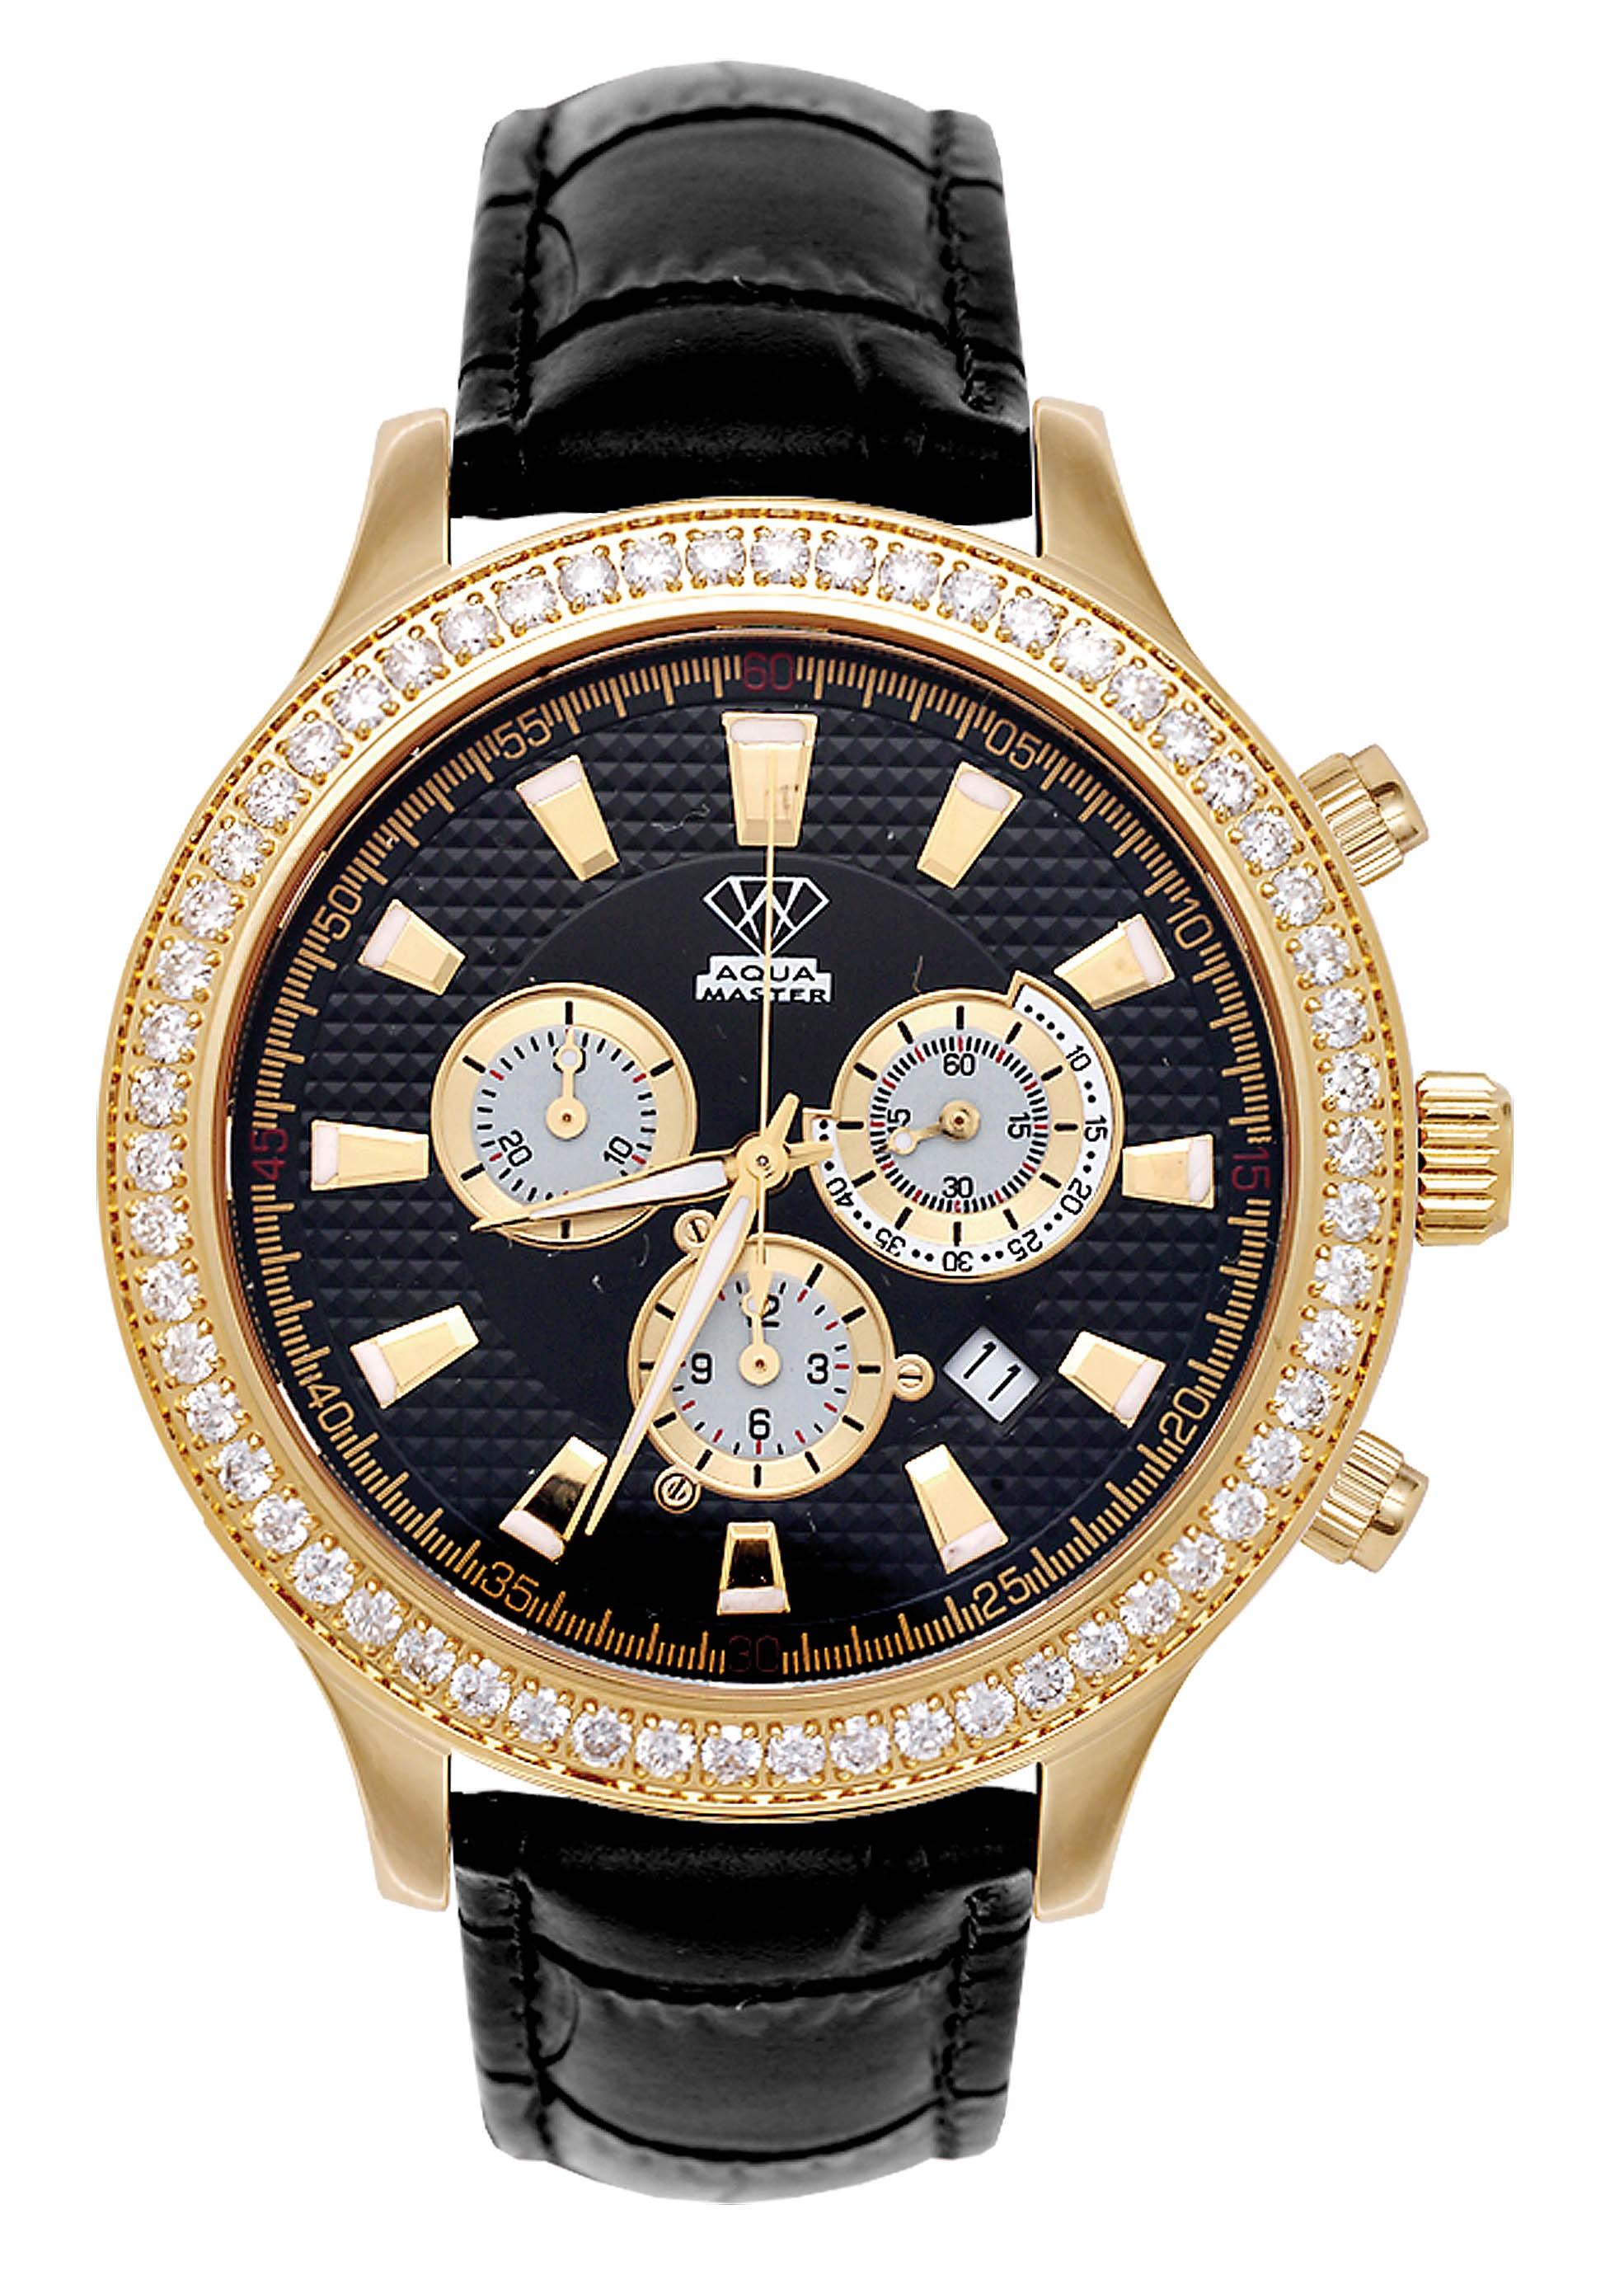 Aqua master watch ltd new watch with sapphire glass for Aqua marine watches